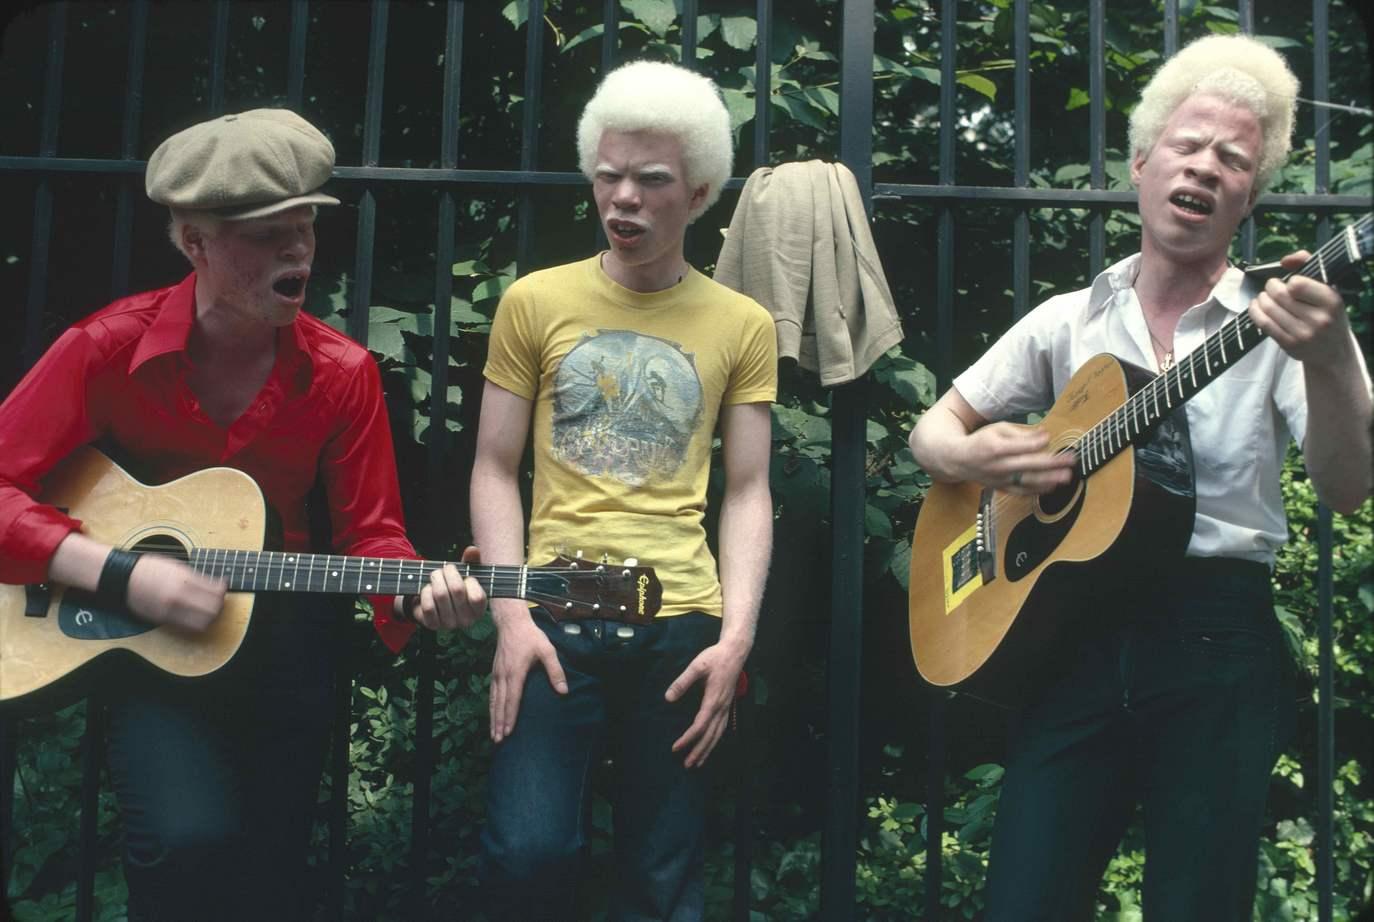 Gottfried-Albino-Musicians-LG